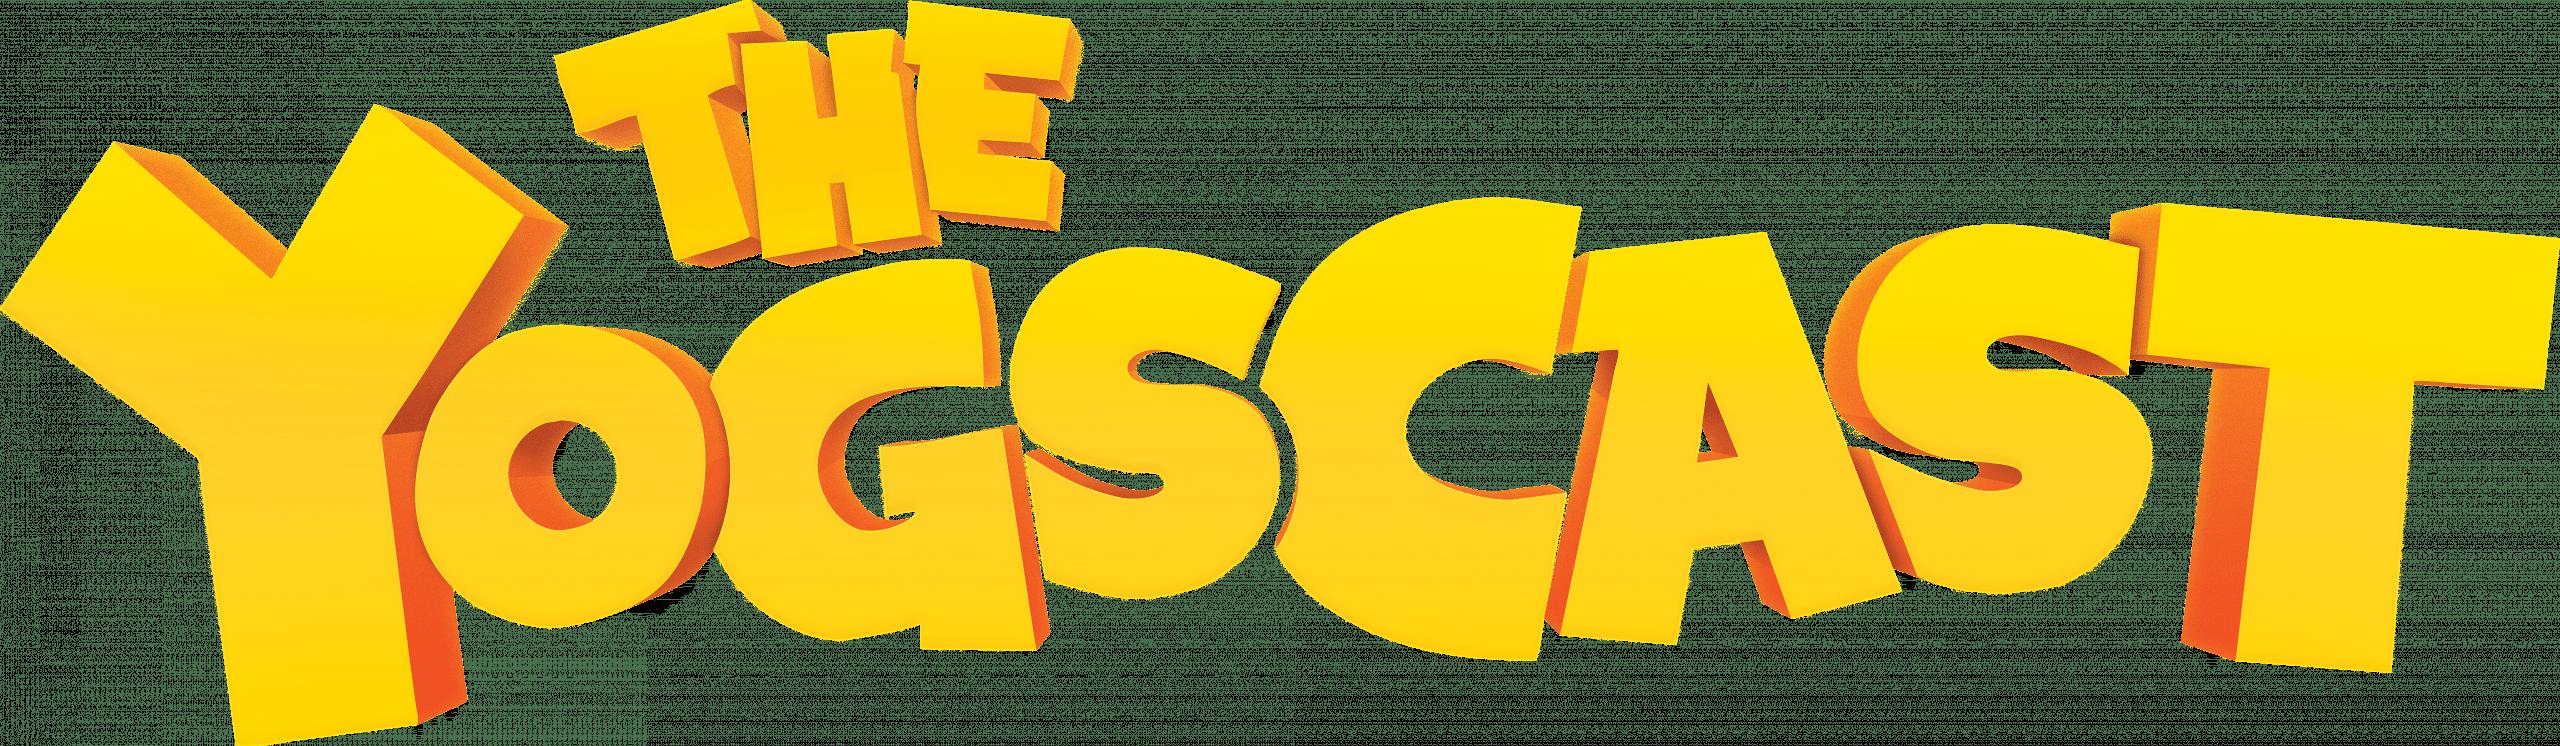 Yogscast3D_Logo_Yellow